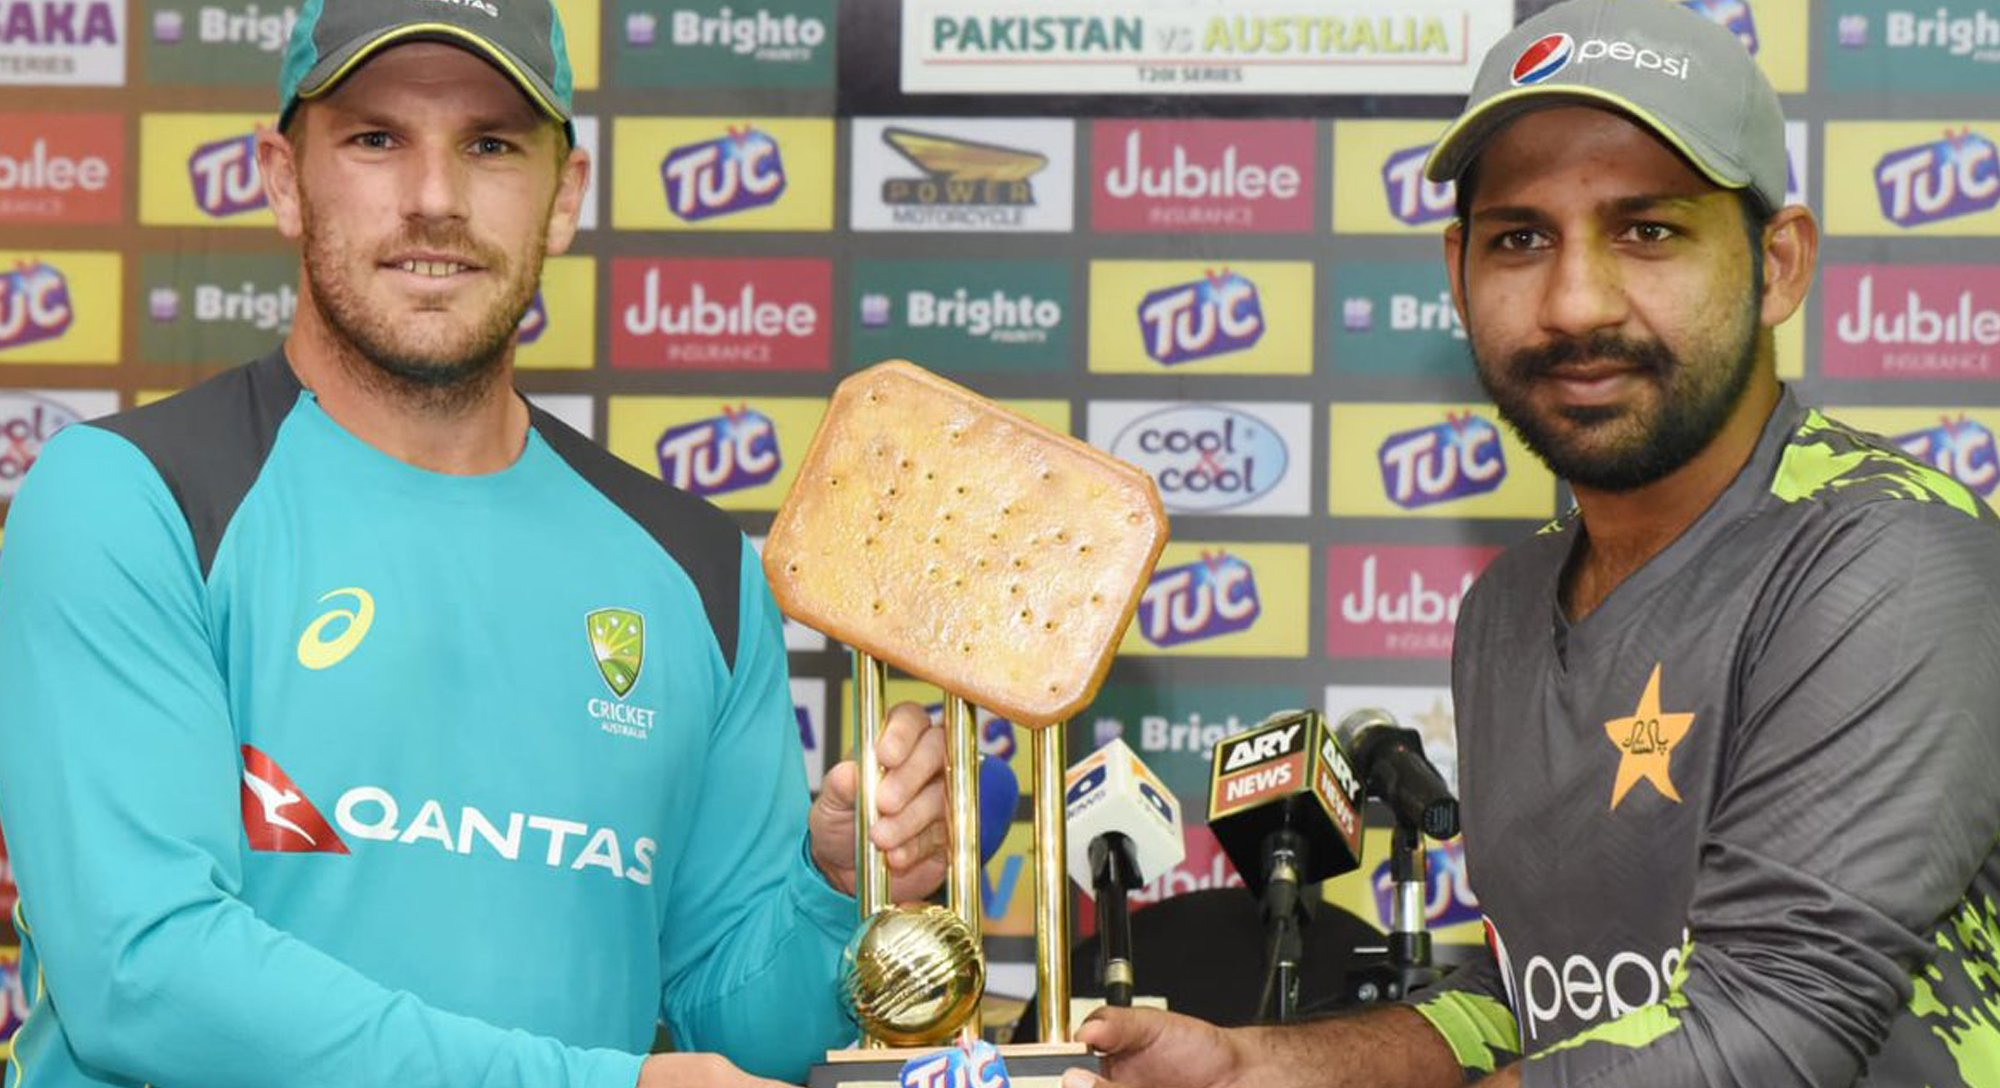 twitter reacts after unveiling of bizarre pakistan australia t20is trophy